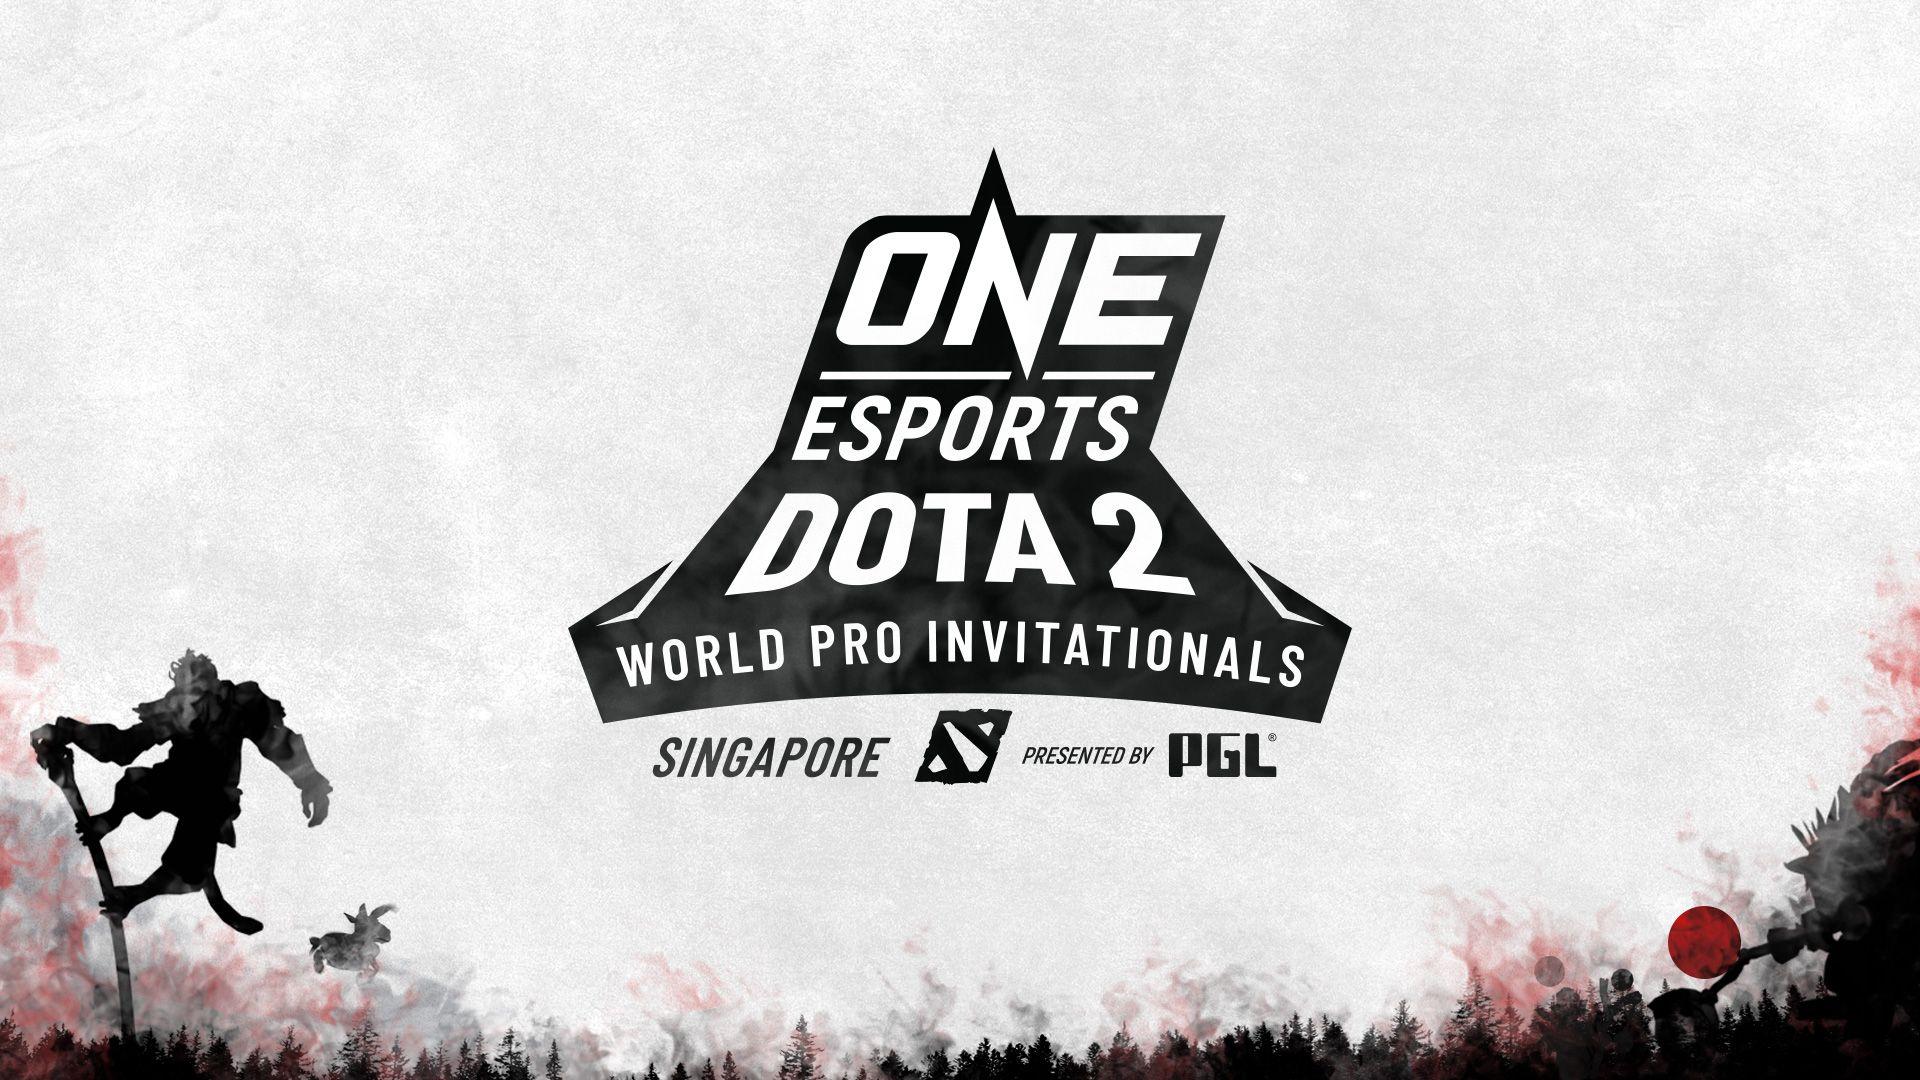 World Pro Invitational ONE Esports Dota 2 Singapore Group A